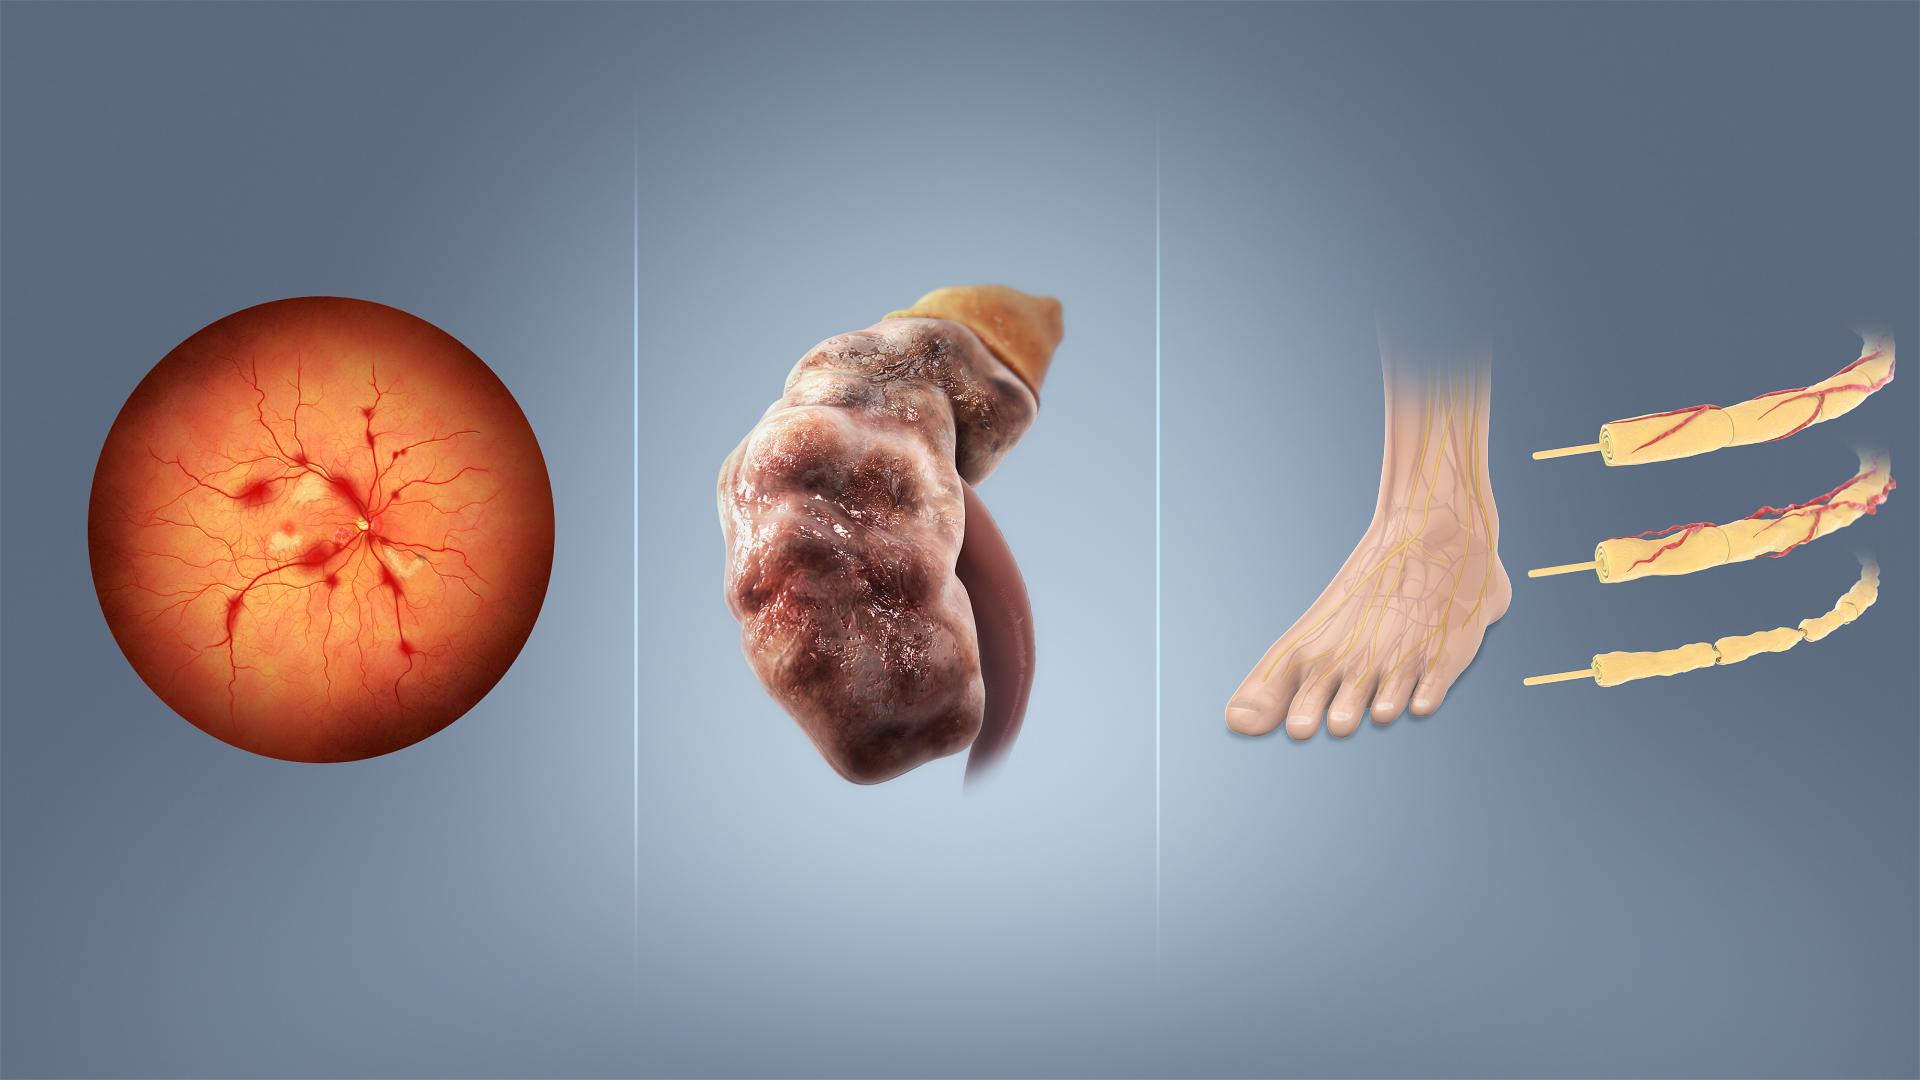 invalidnosti hipertenzija tip 2 diabetes mellitus